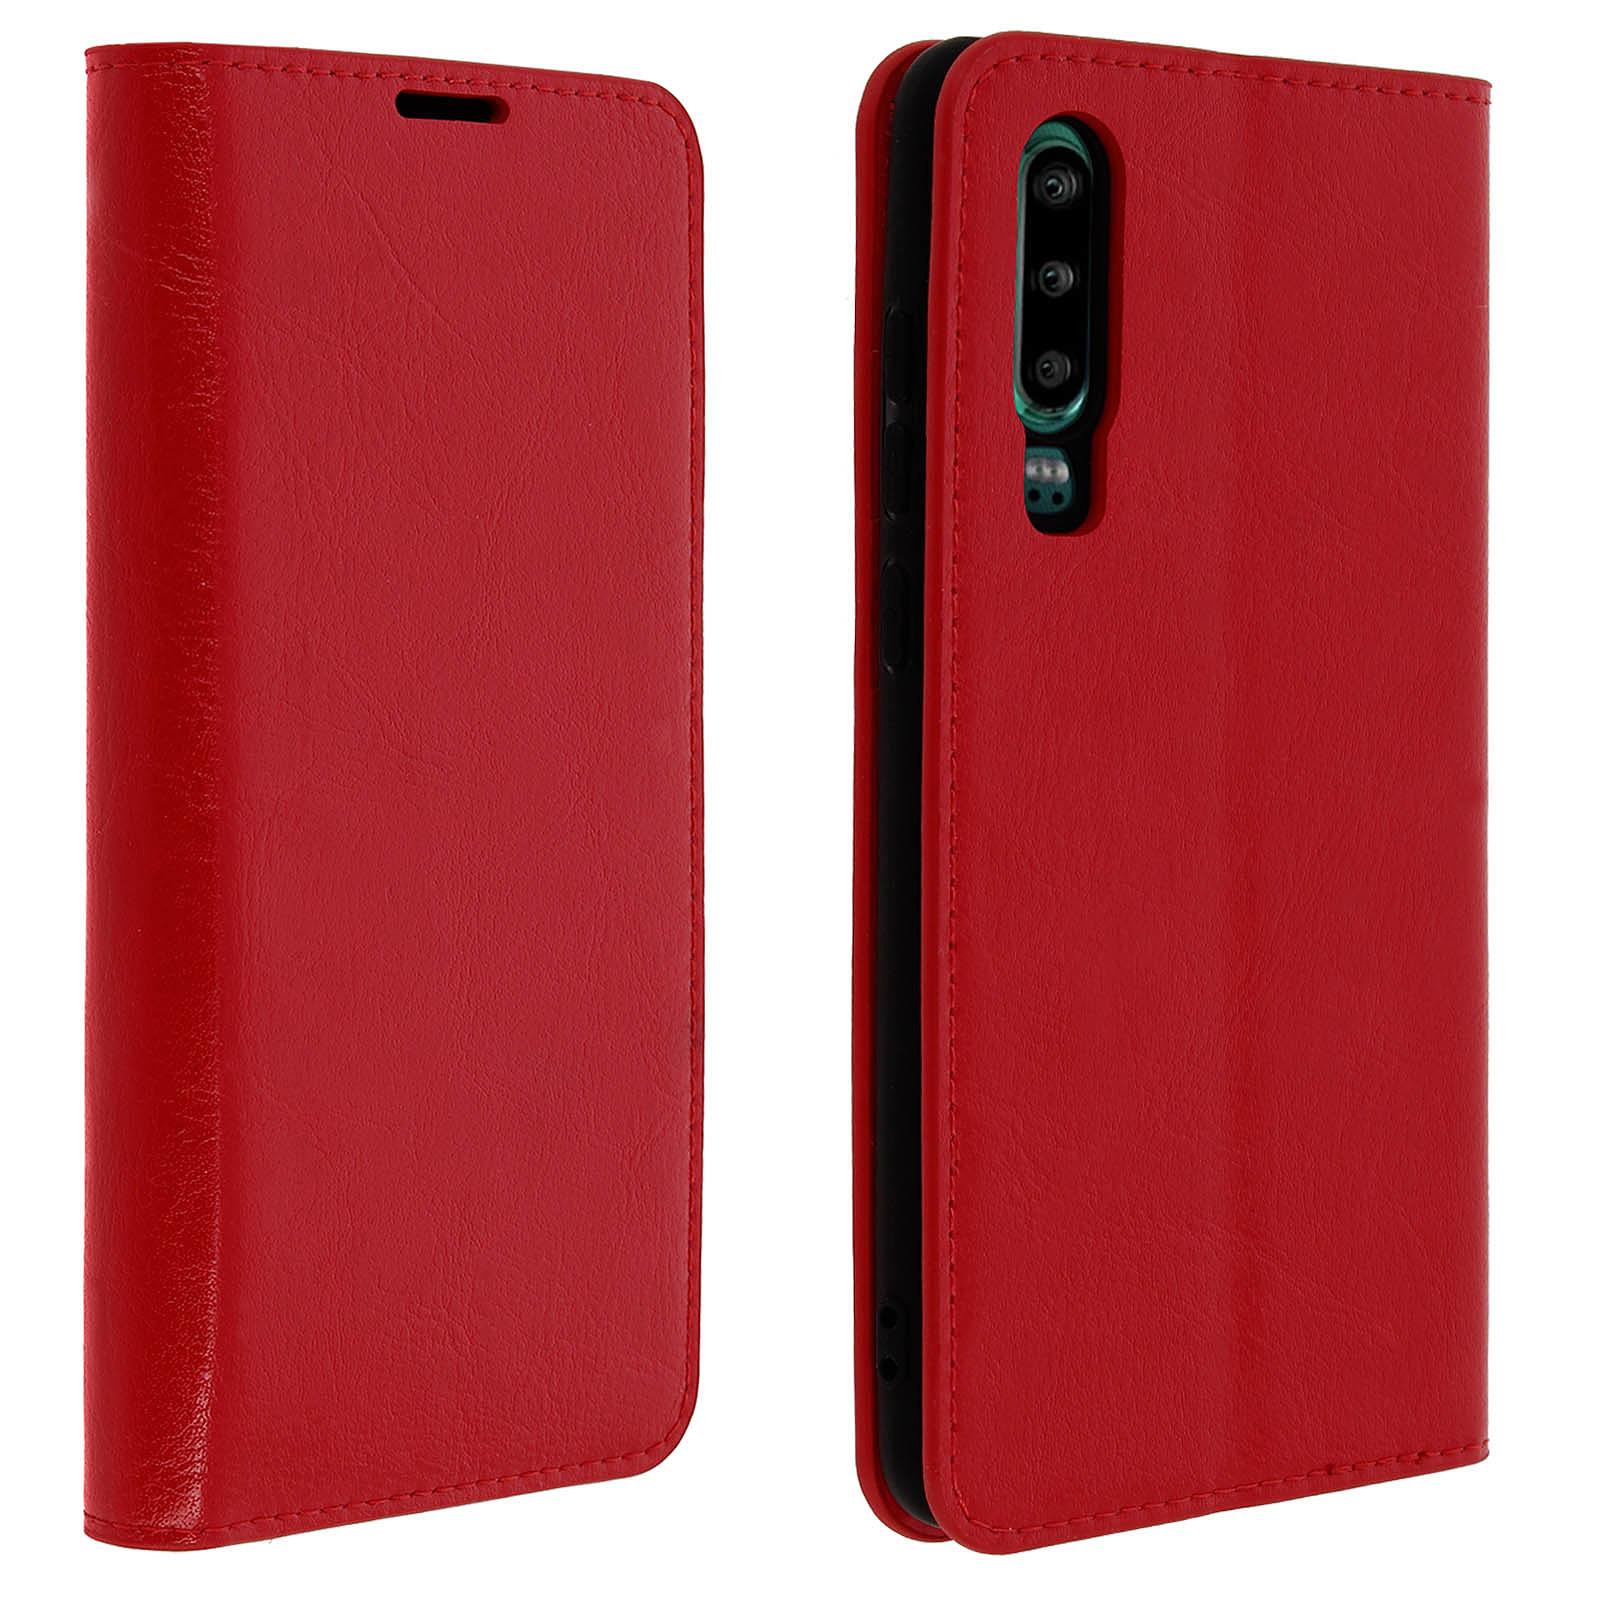 Avizar Etui folio Rouge pour Huawei P30